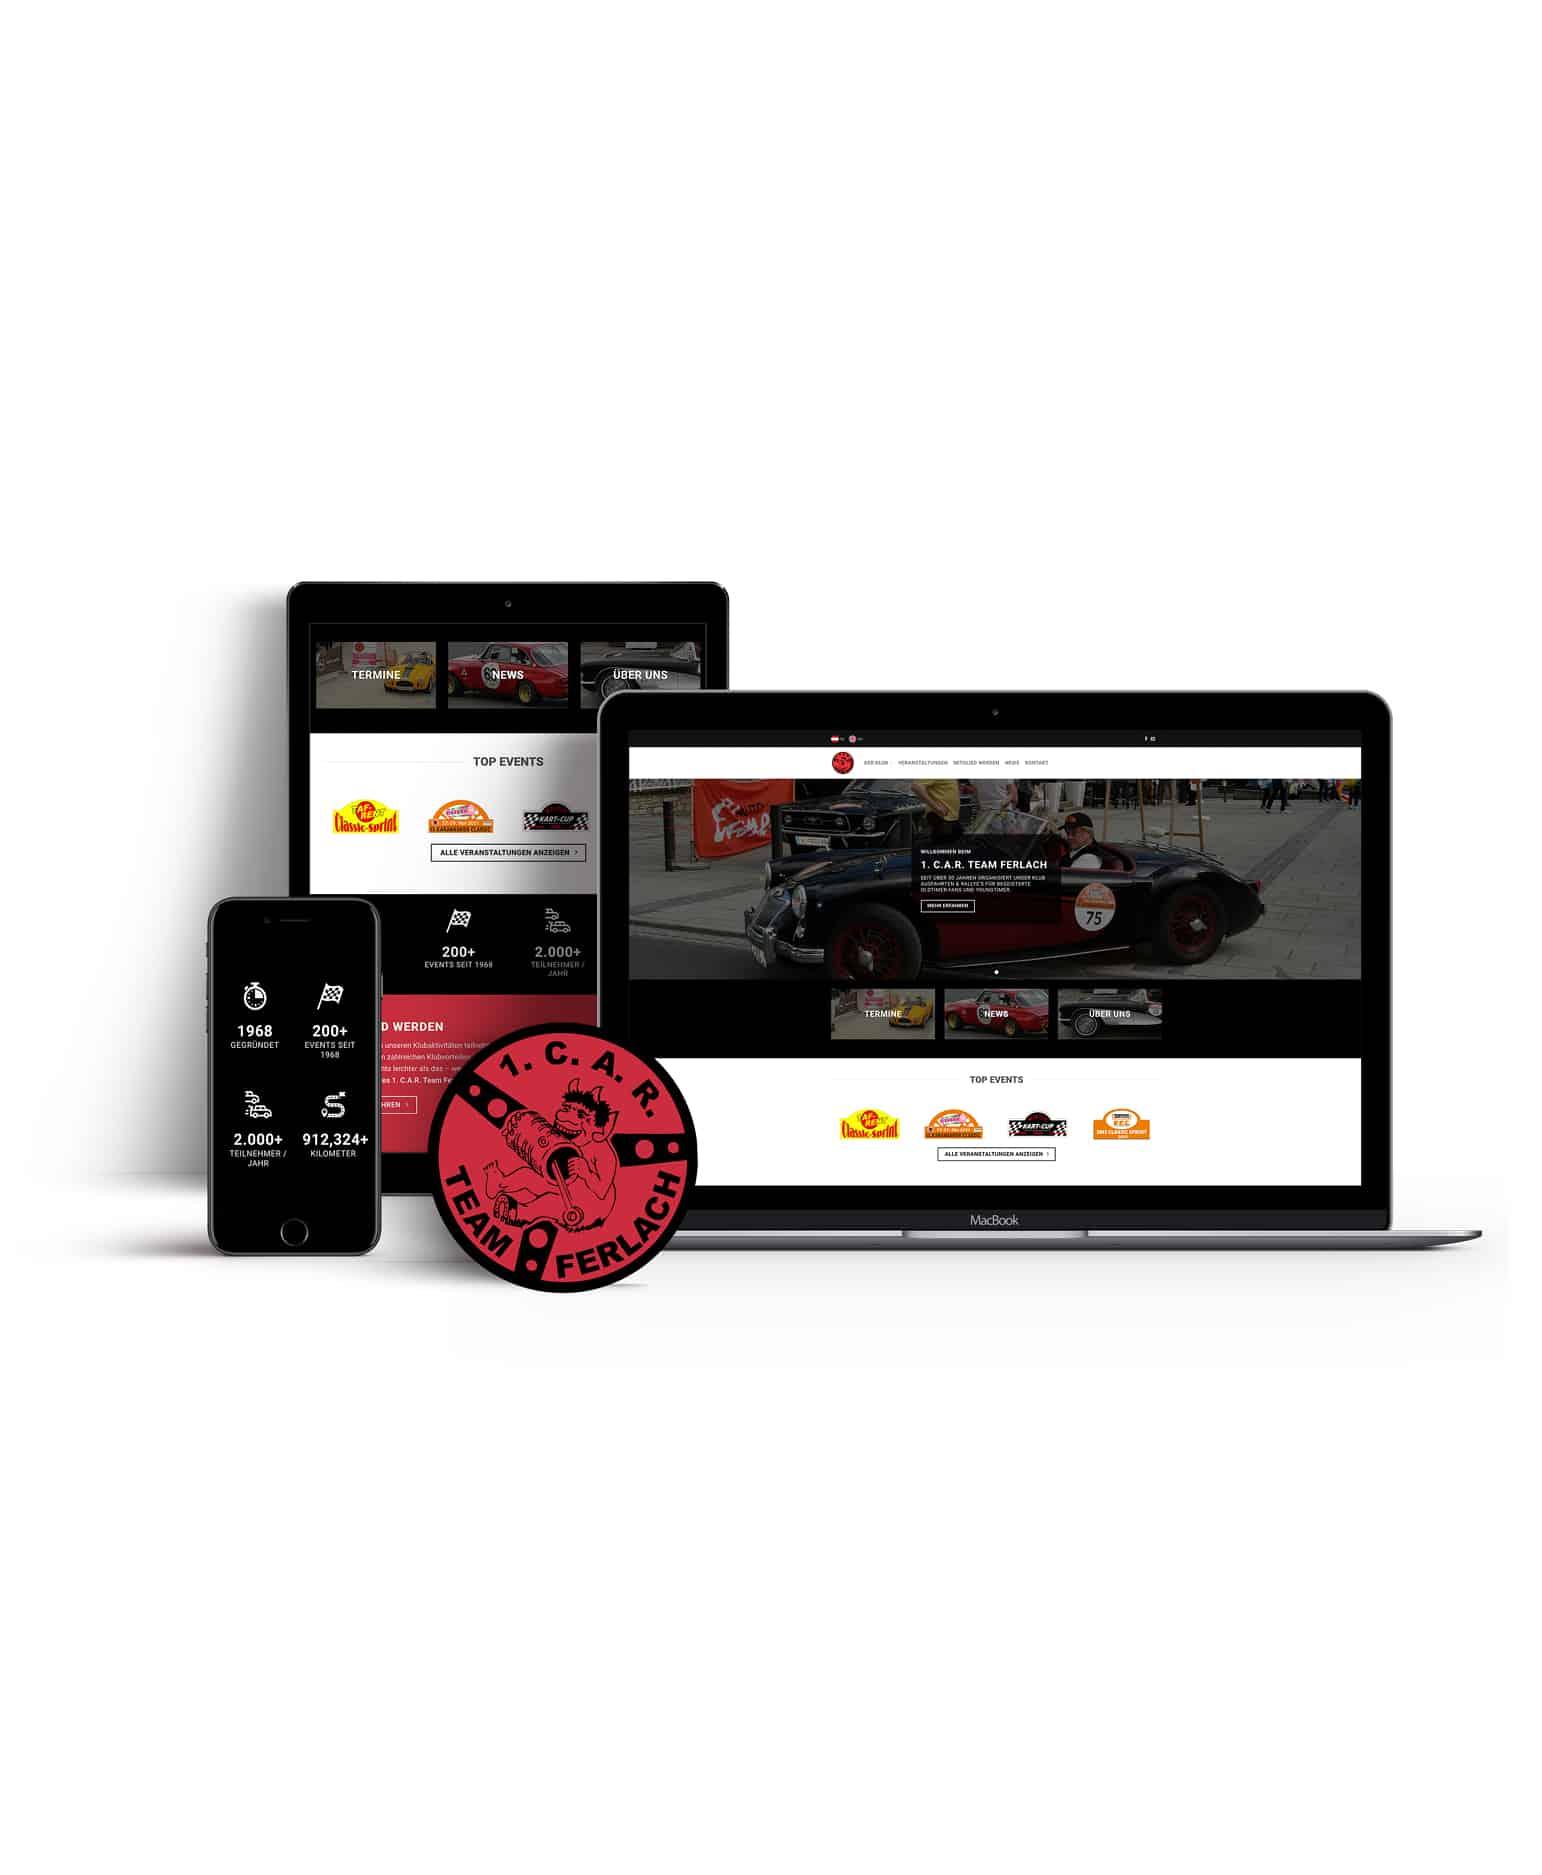 Car Team Ferlach - Ältester Motorsportverein, Motorsportclub in Kärnten - Duplicate